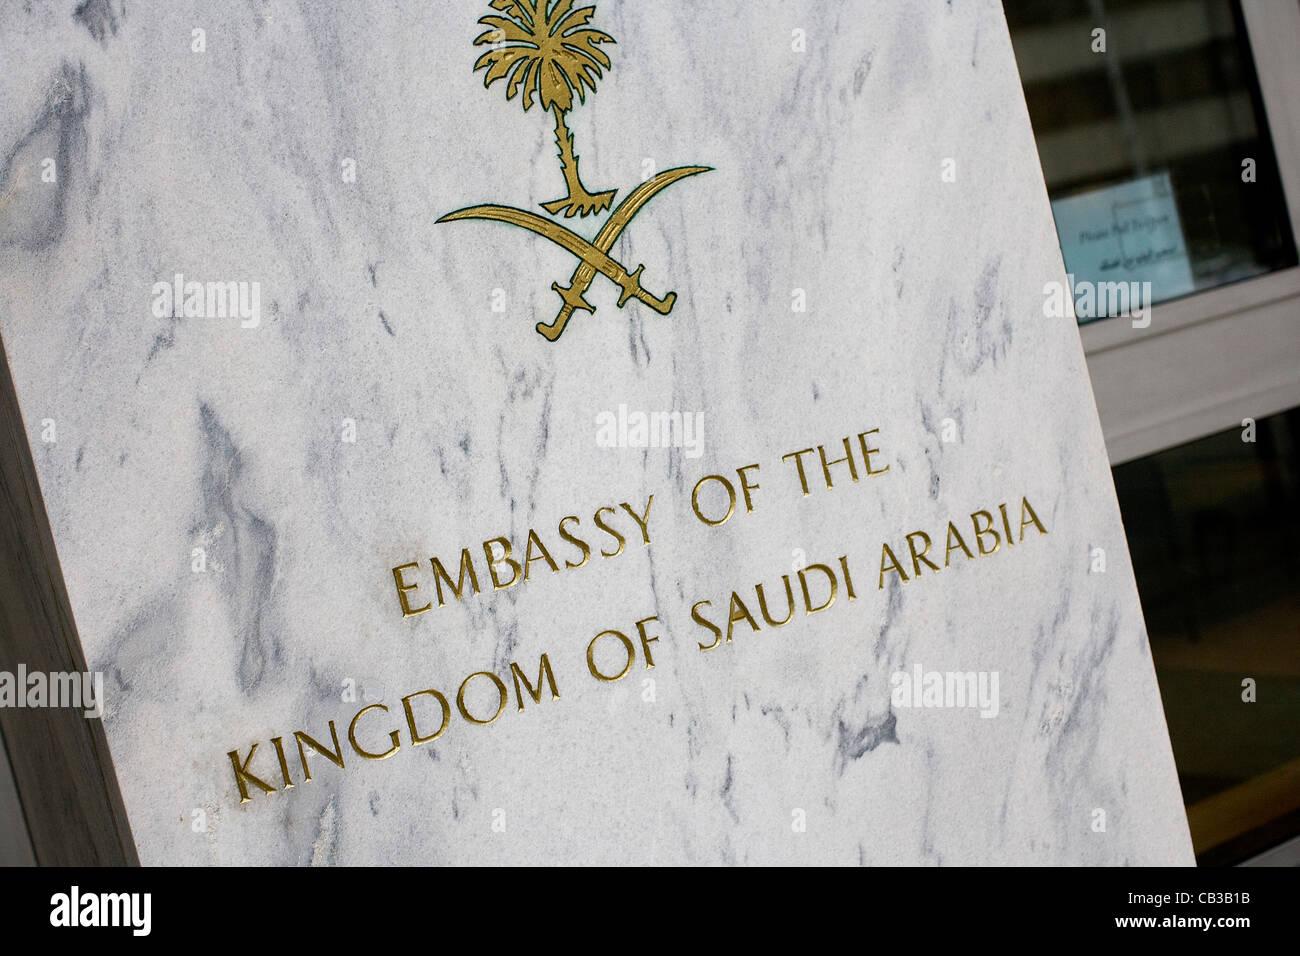 L'ambassade du Royaume d'Arabie Saoudite à Washington, DC. Photo Stock